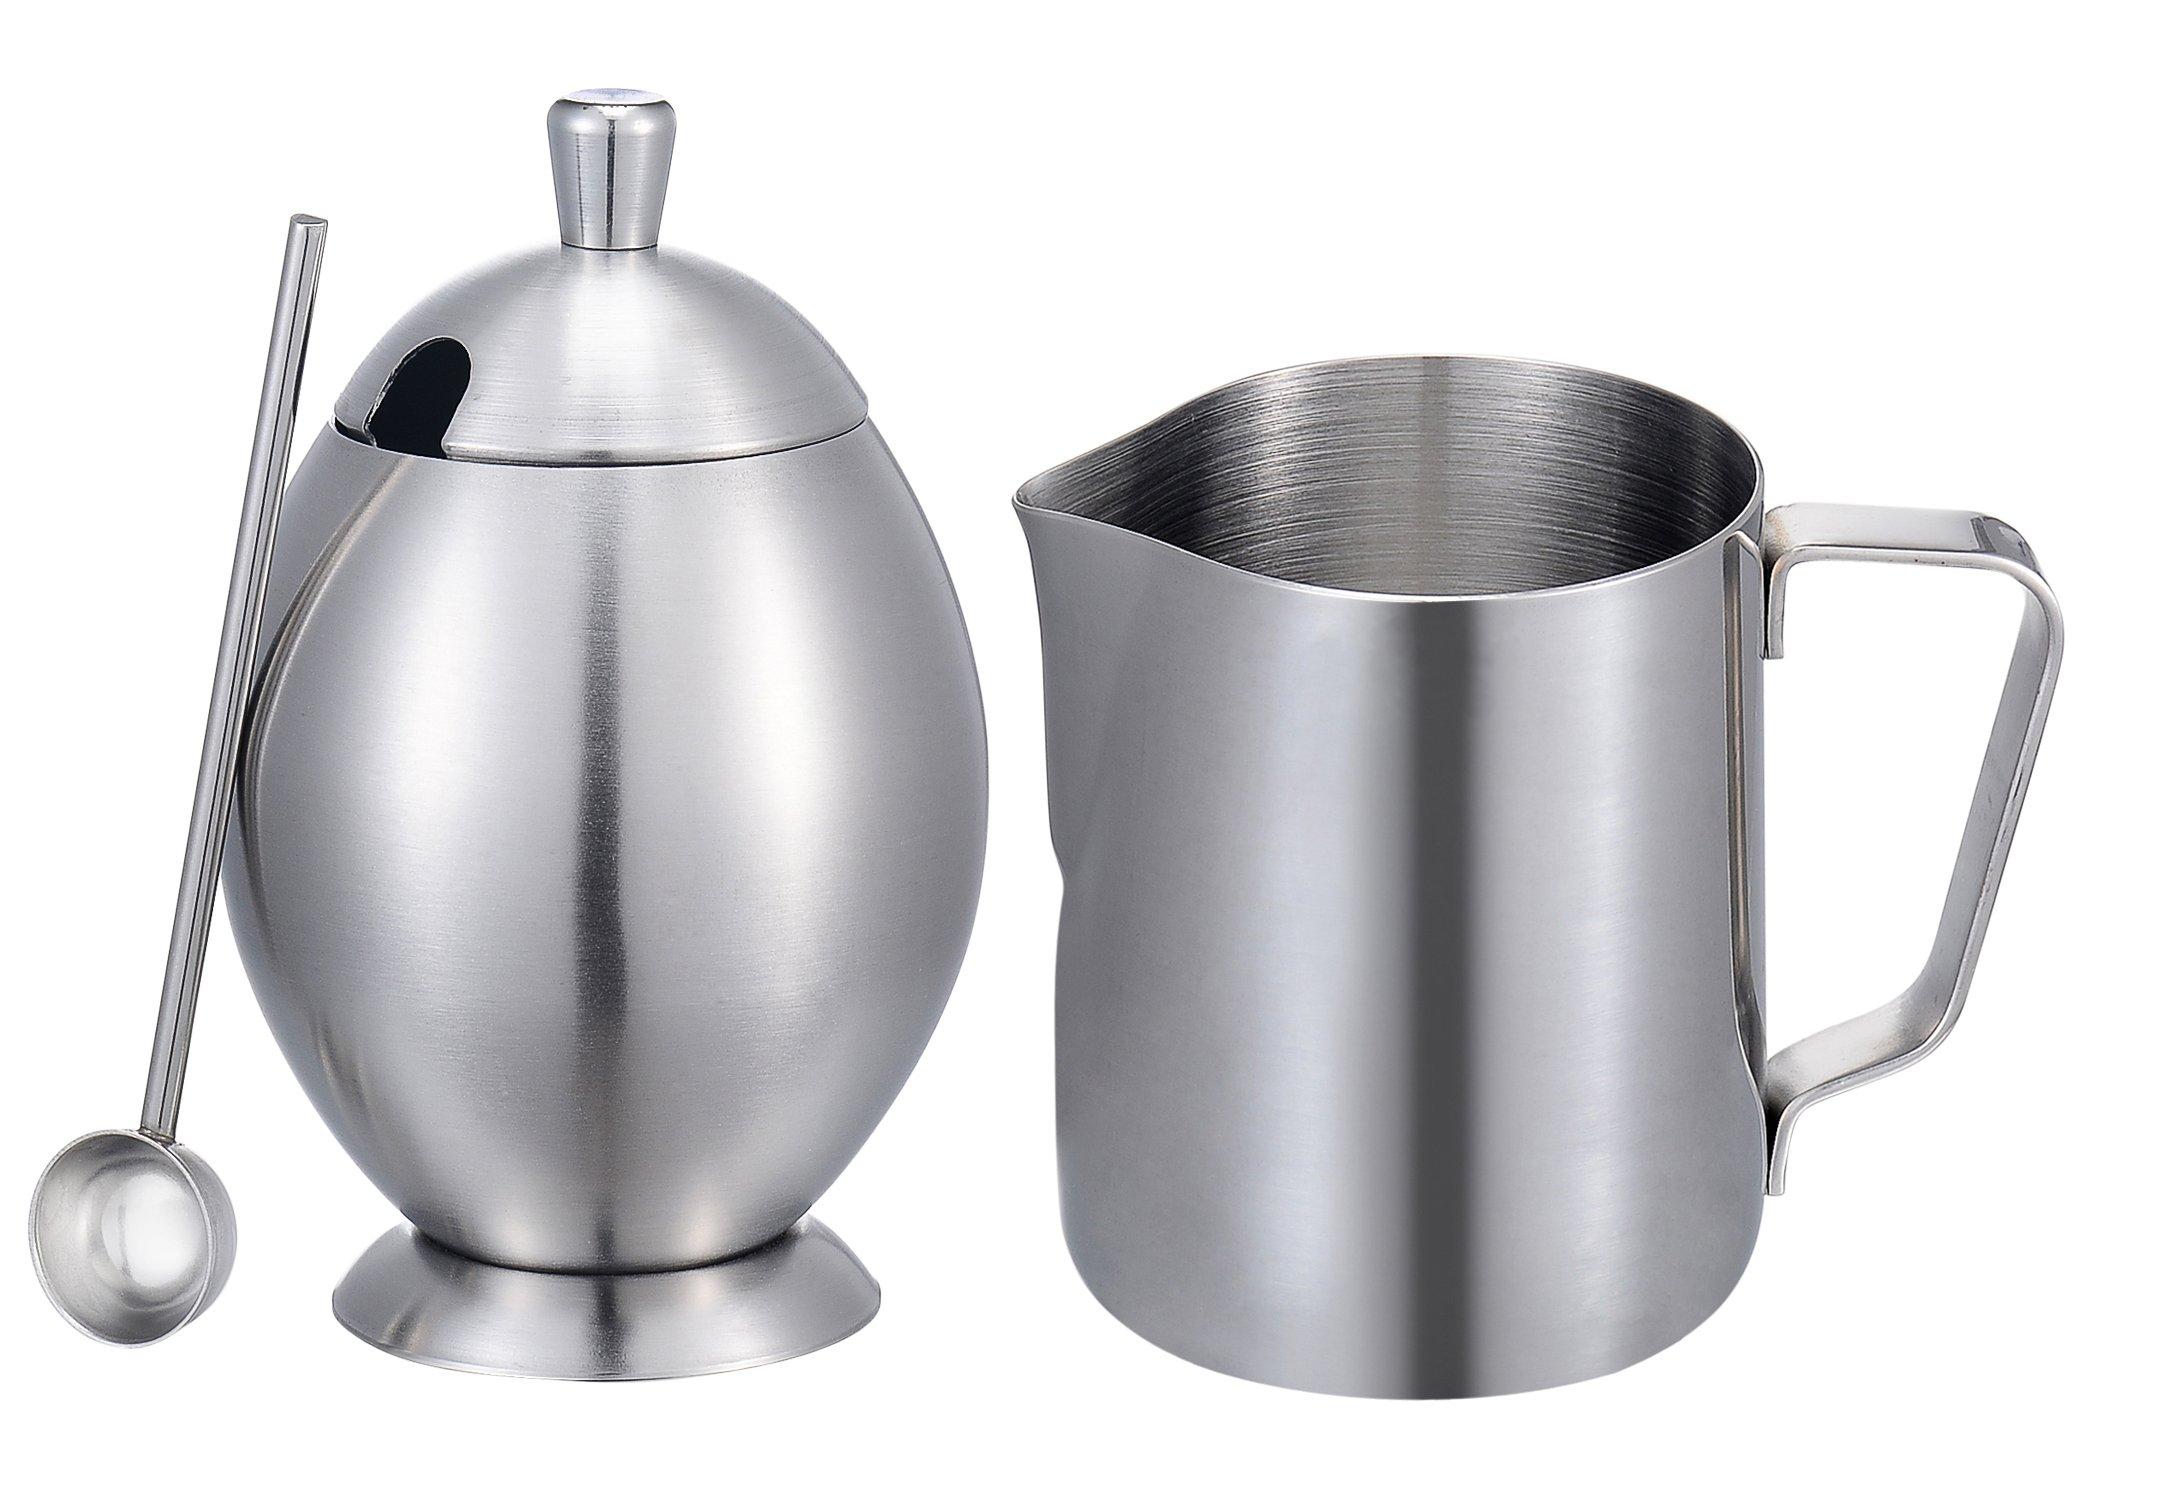 Sugar and creamer set, KSENDALO Deluxe Stainless 12Oz Milk Pitcher & Sugar Bowl Pot Set, For Coffee, Latte, Tea & Frothing Milk